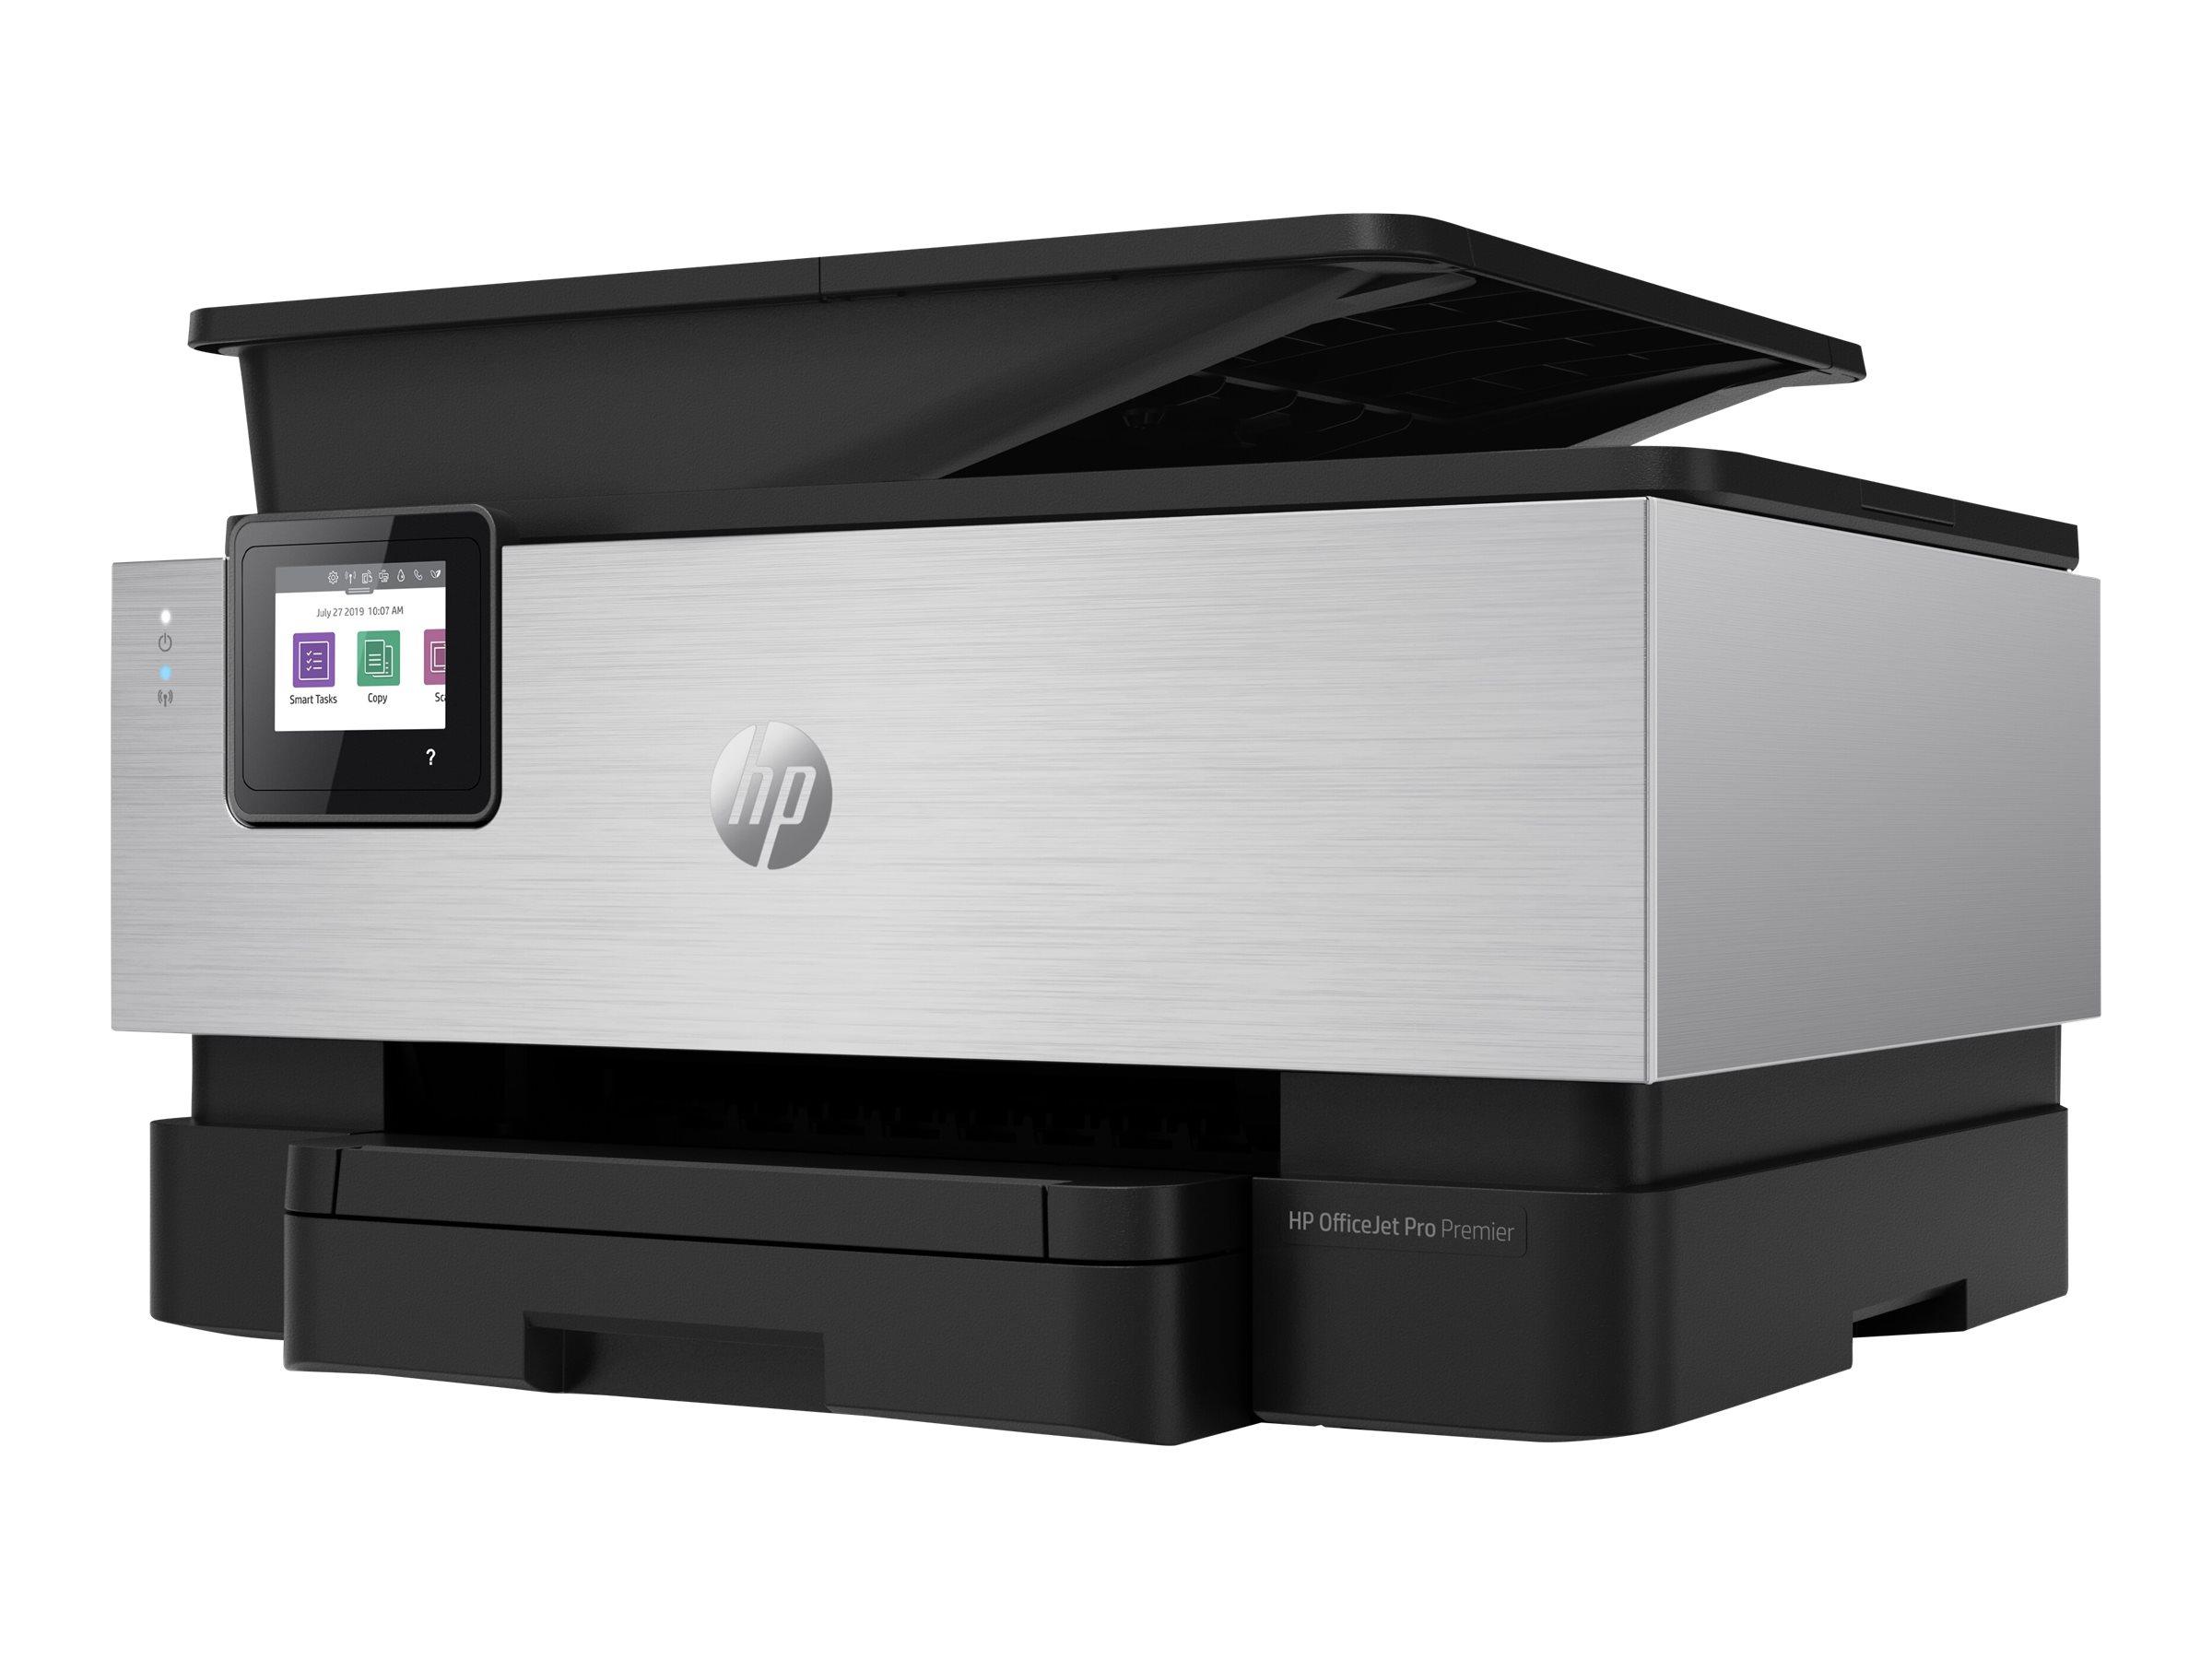 HP Officejet Pro 9019/Premier All-in-One - Multifunktionsdrucker - Farbe - Tintenstrahl - Legal (216 x 356 mm) (Original) - A4/L